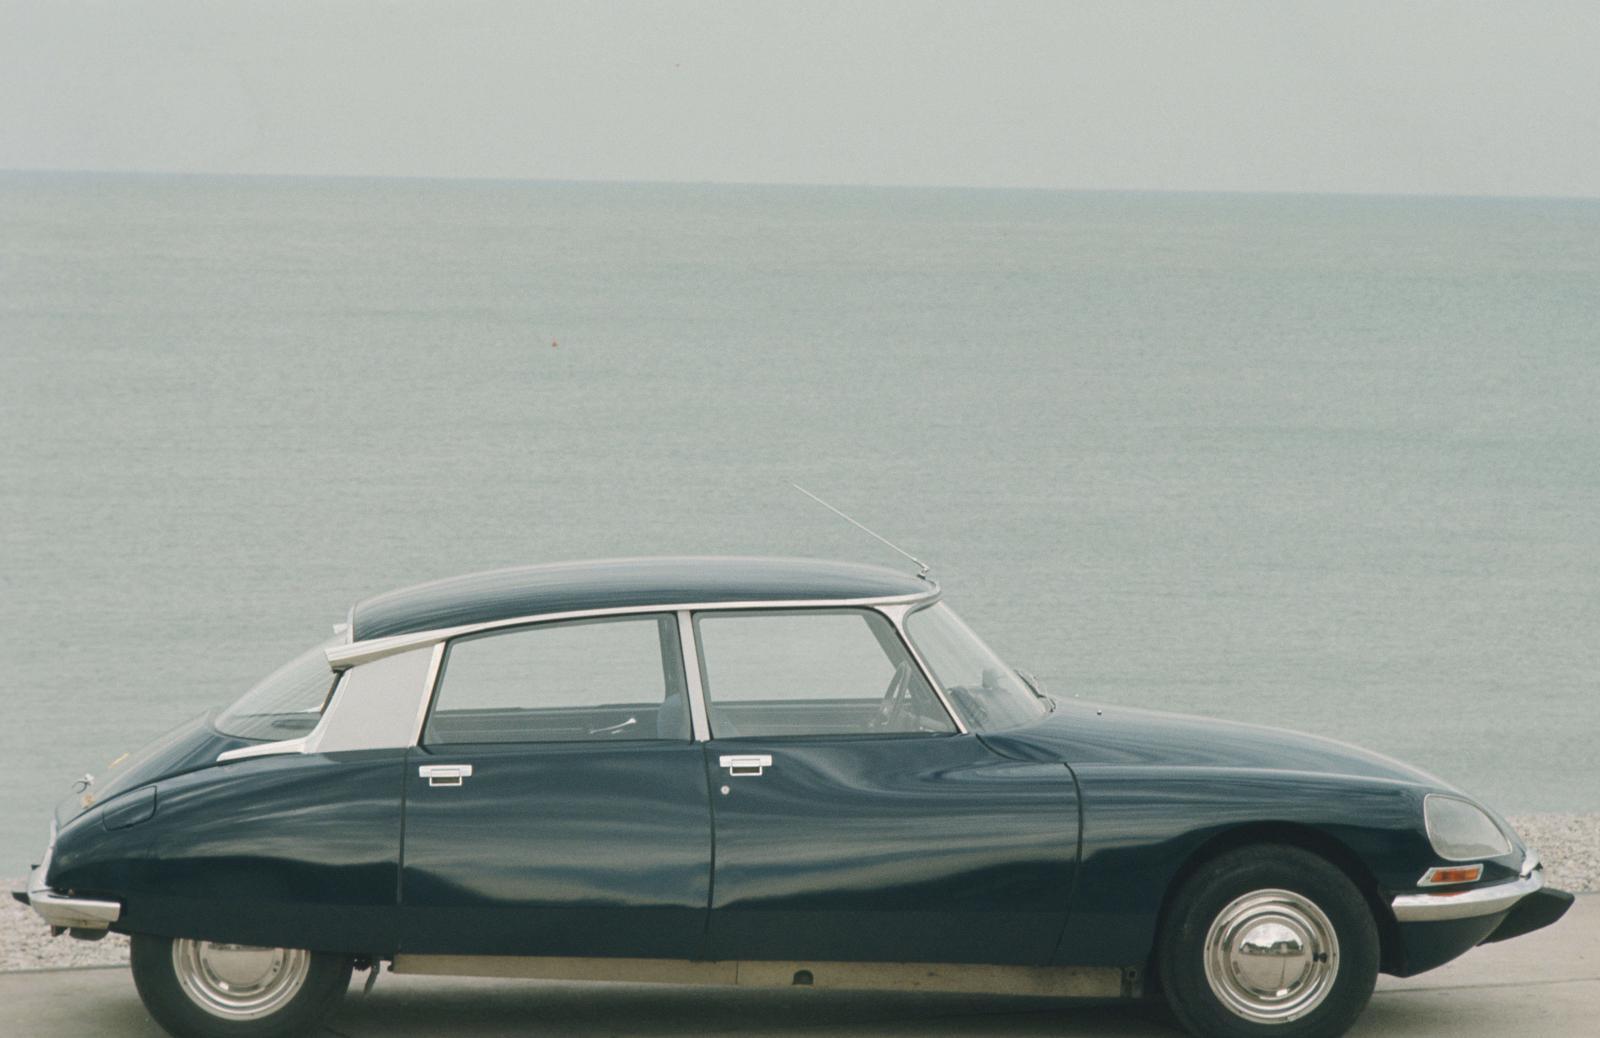 Citroën DS 21 - 1968 - Bord de mer